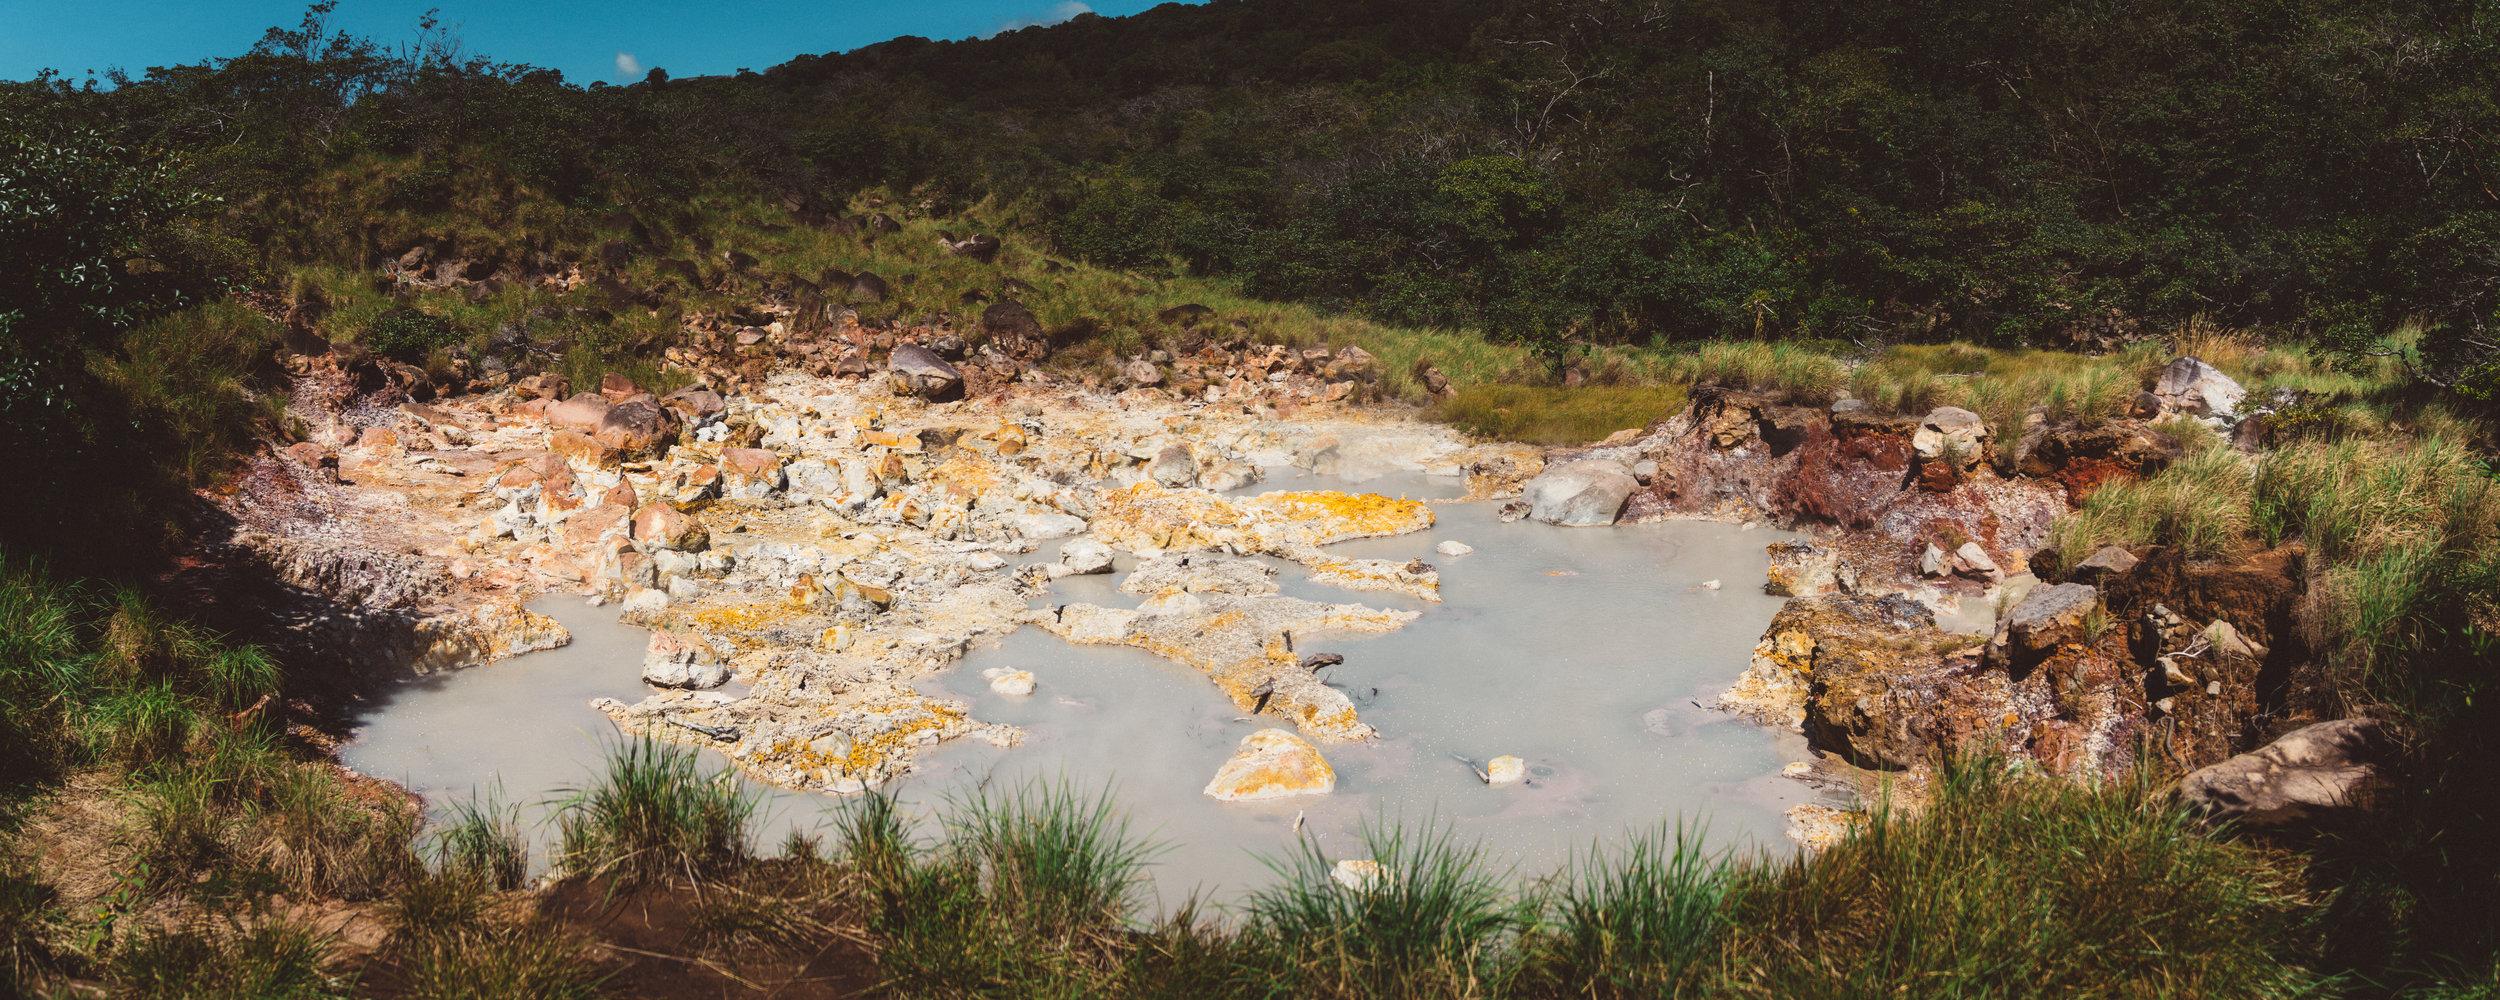 Mud pits at Rincon de la Vieja National Park.